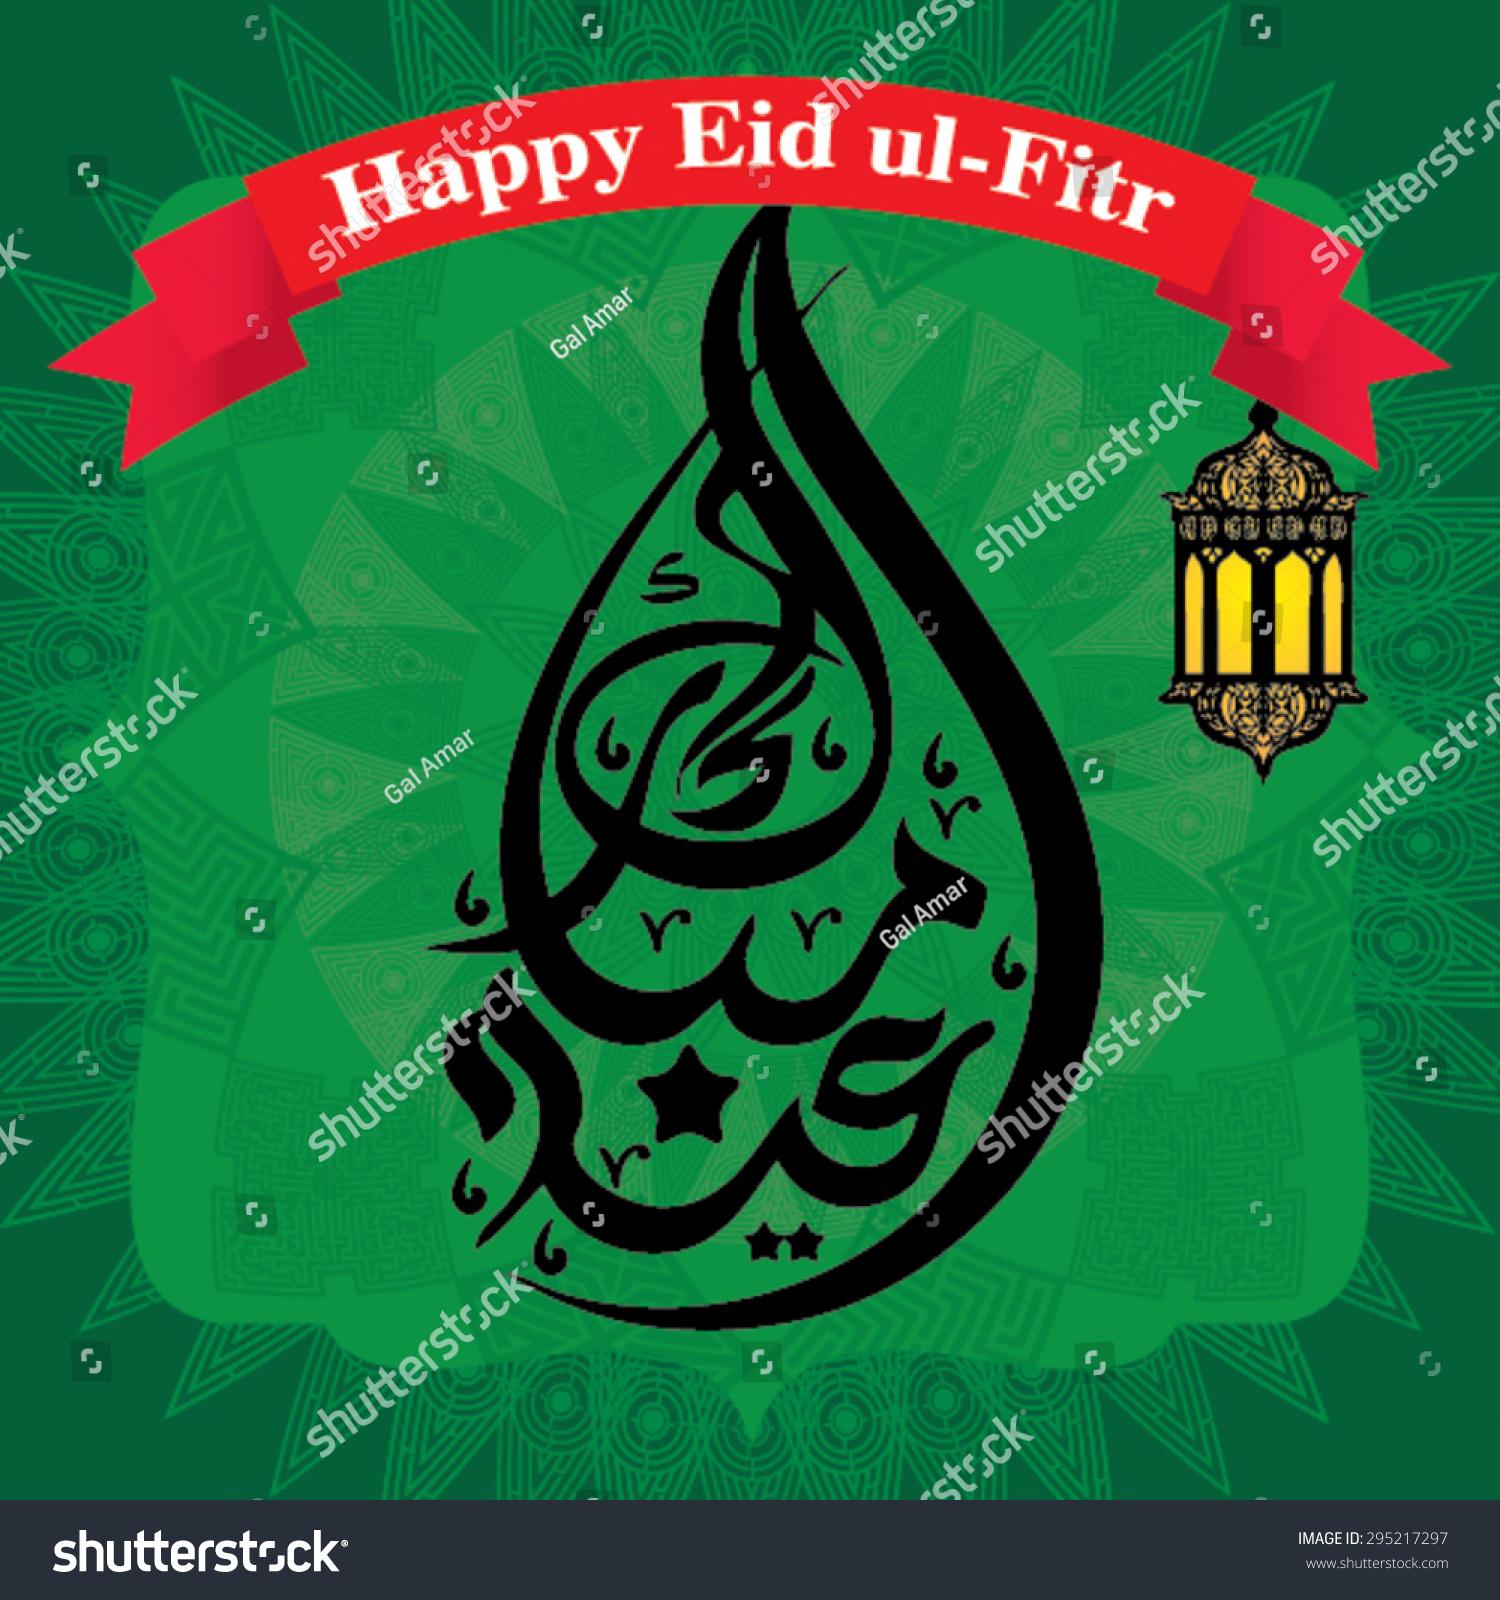 Eid Ul Fitr Big Sale Greeting Stock Vector Royalty Free 295217297